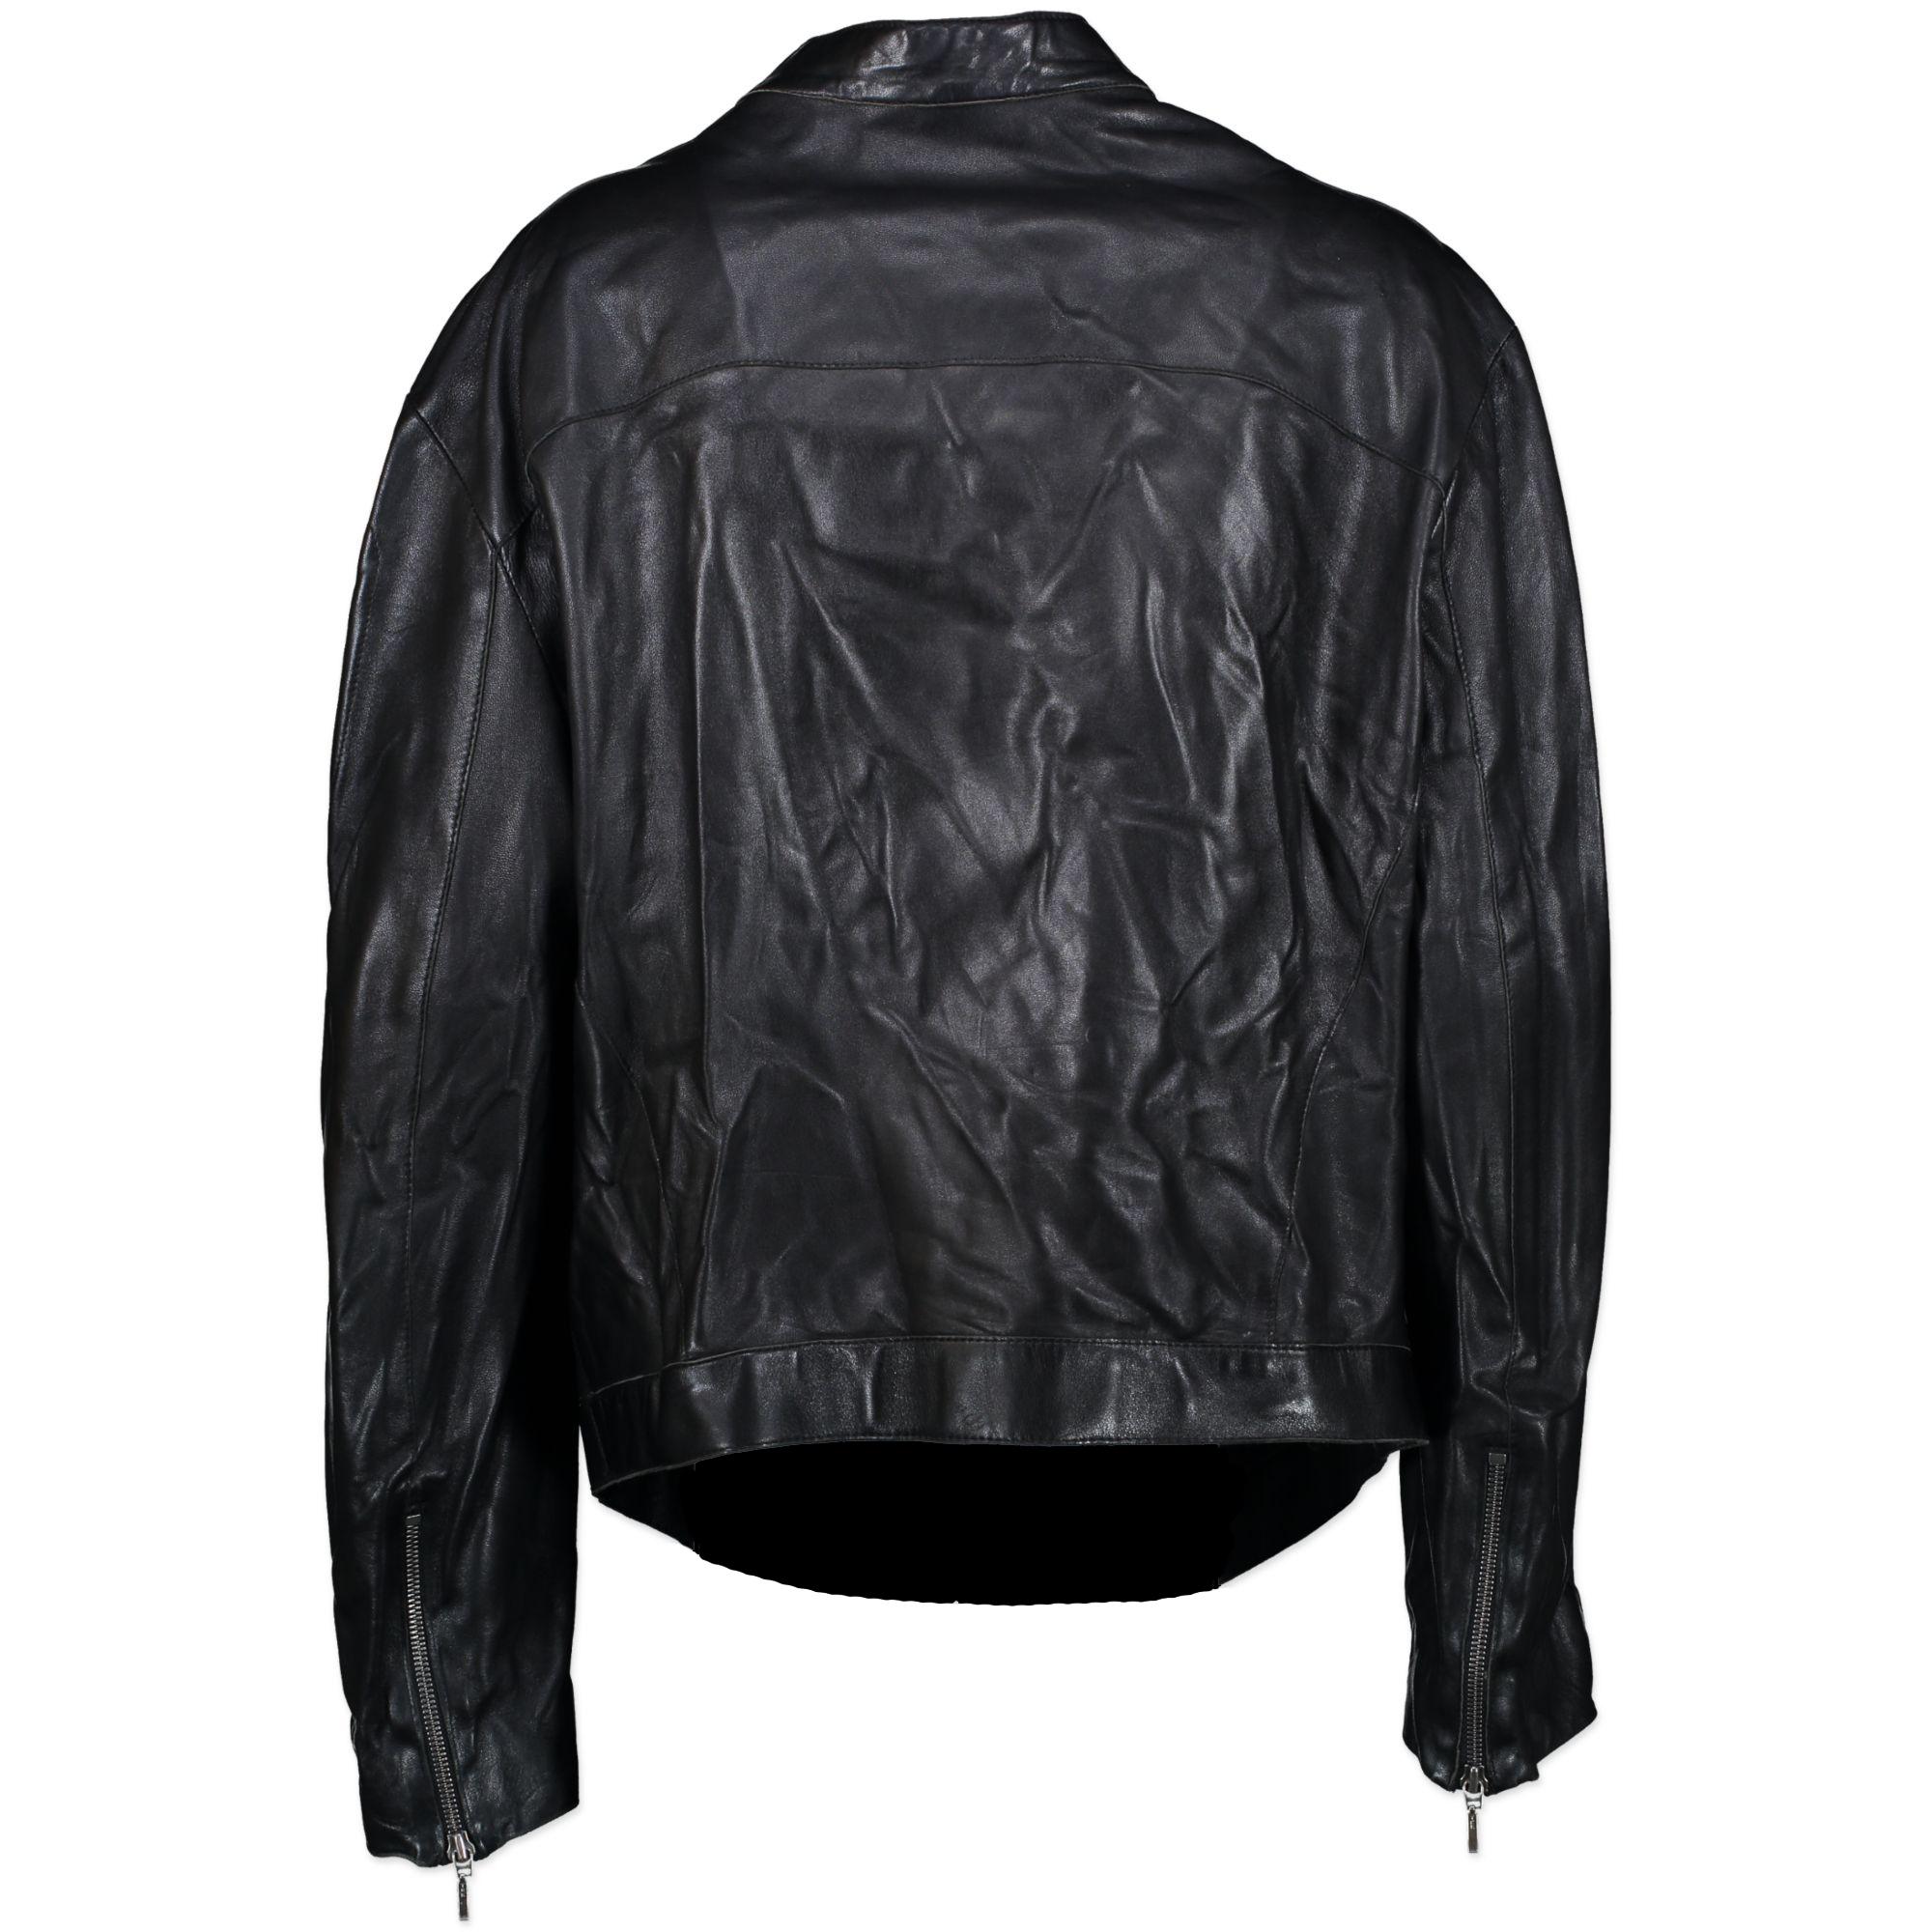 Thierry Mugler Black Leather Jacket - SIZE TU. Koop tweedehands Thierry Mugler online bij LabelLOV